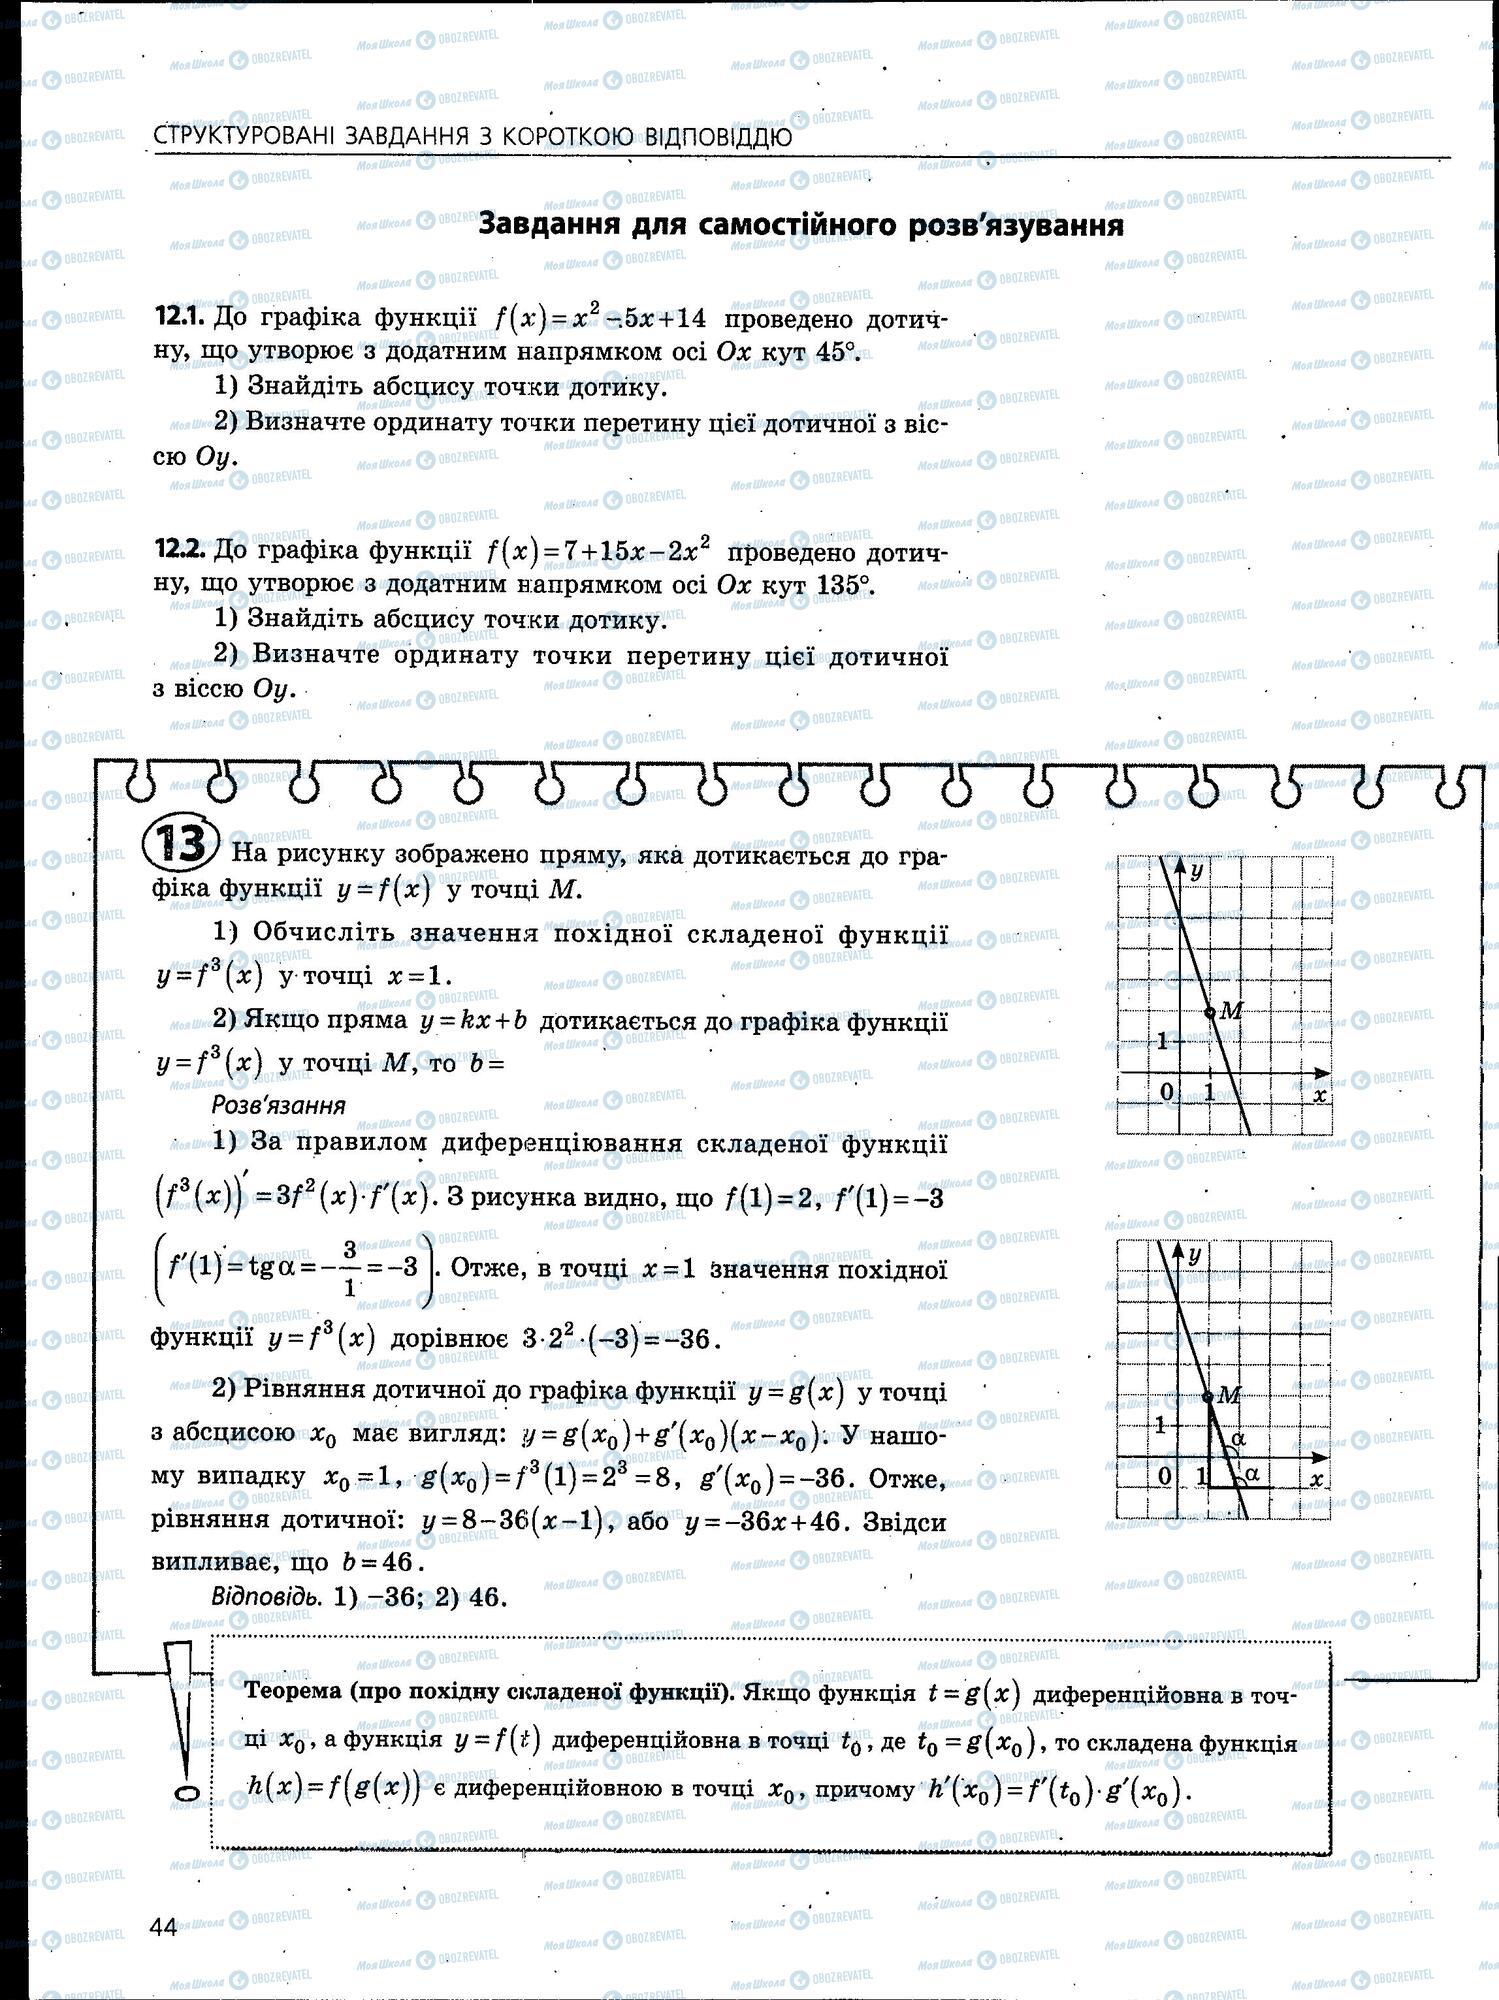 ЗНО Математика 11 класс страница 44